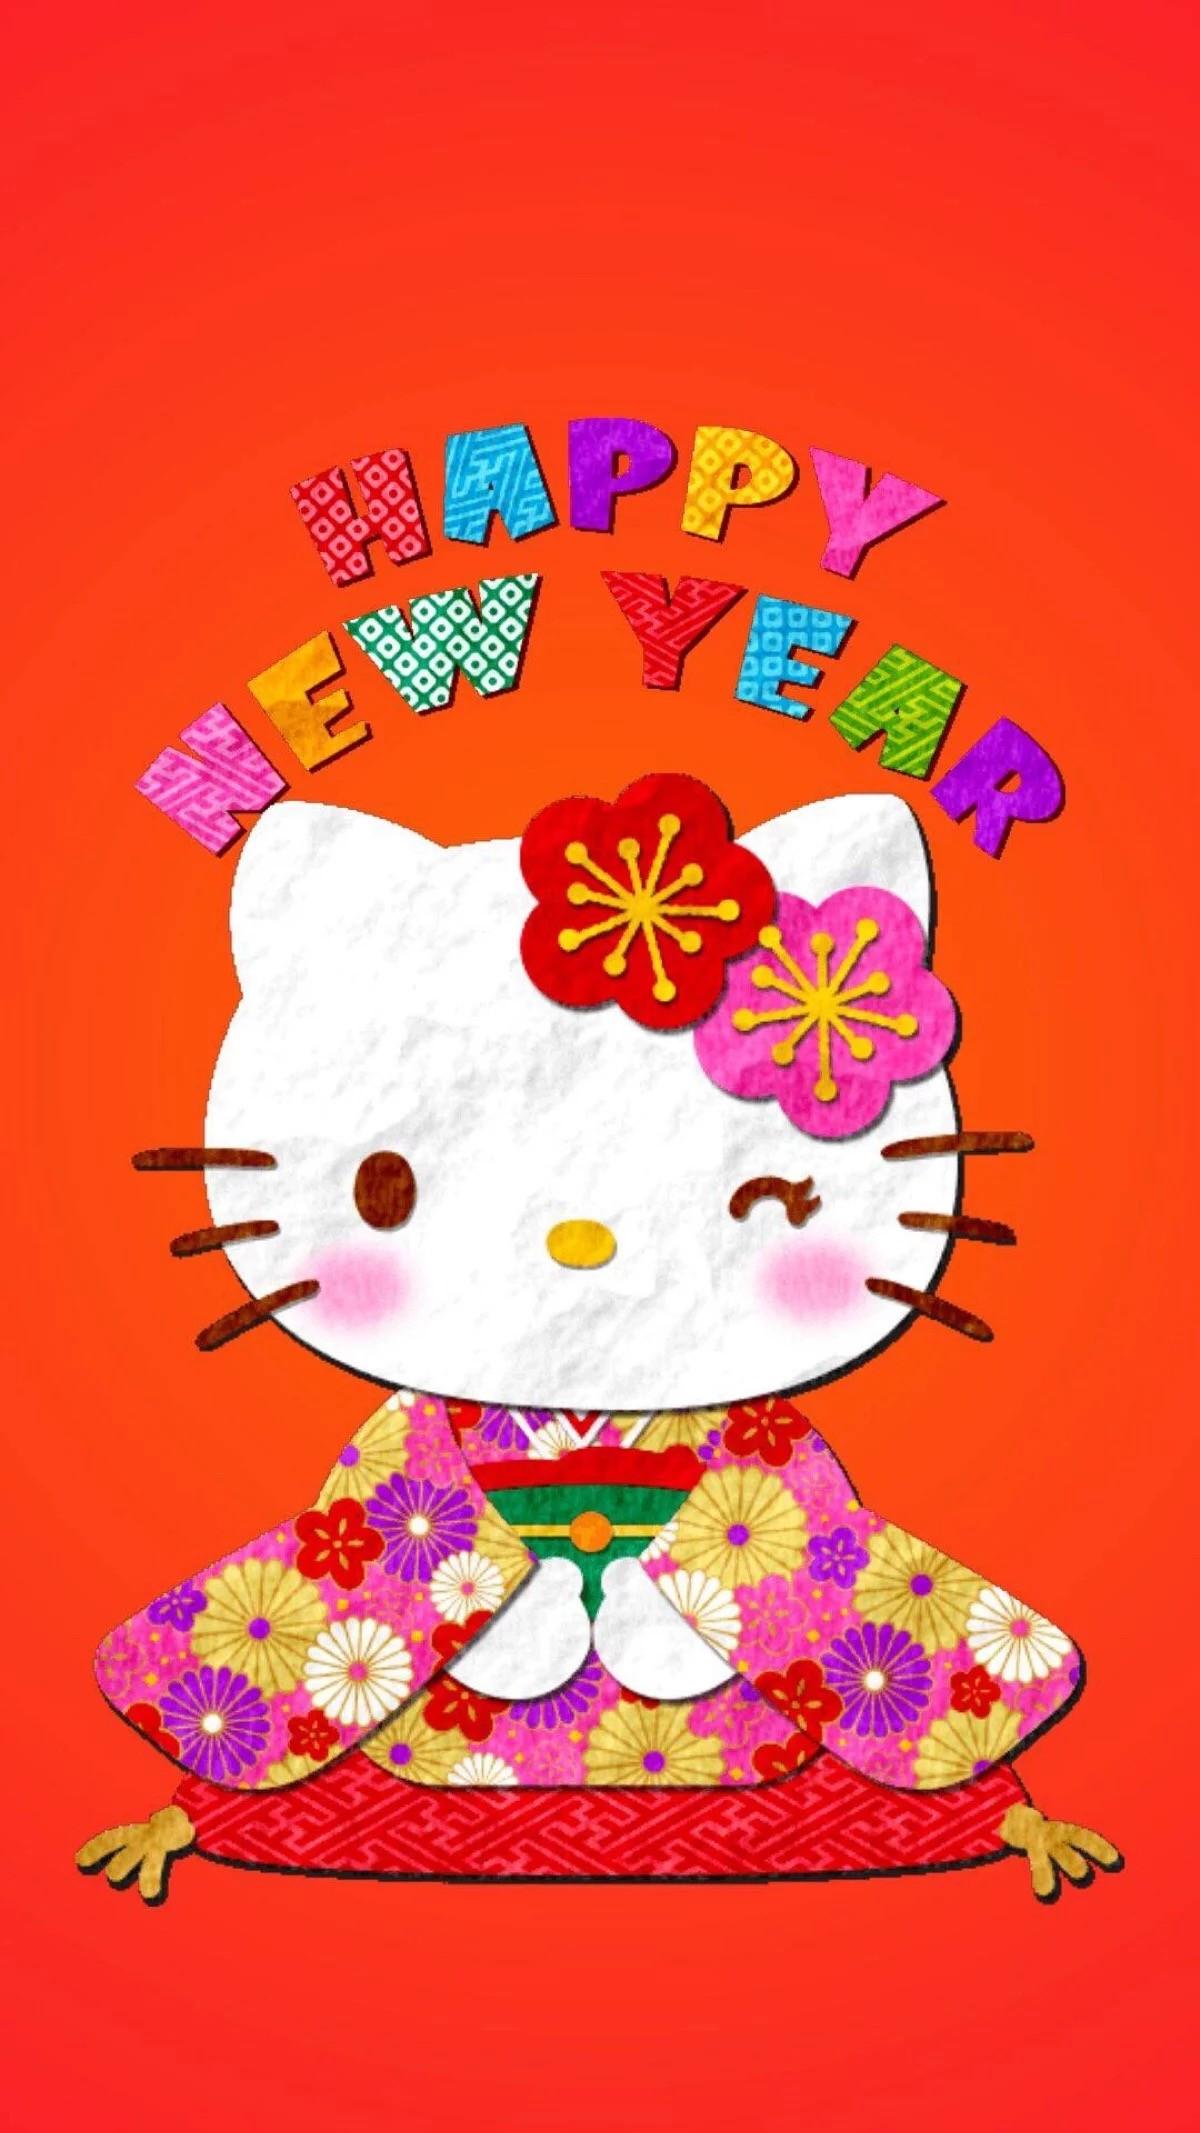 Download Wallpaper Hello Kitty Orange - 262947  HD_468074.jpg